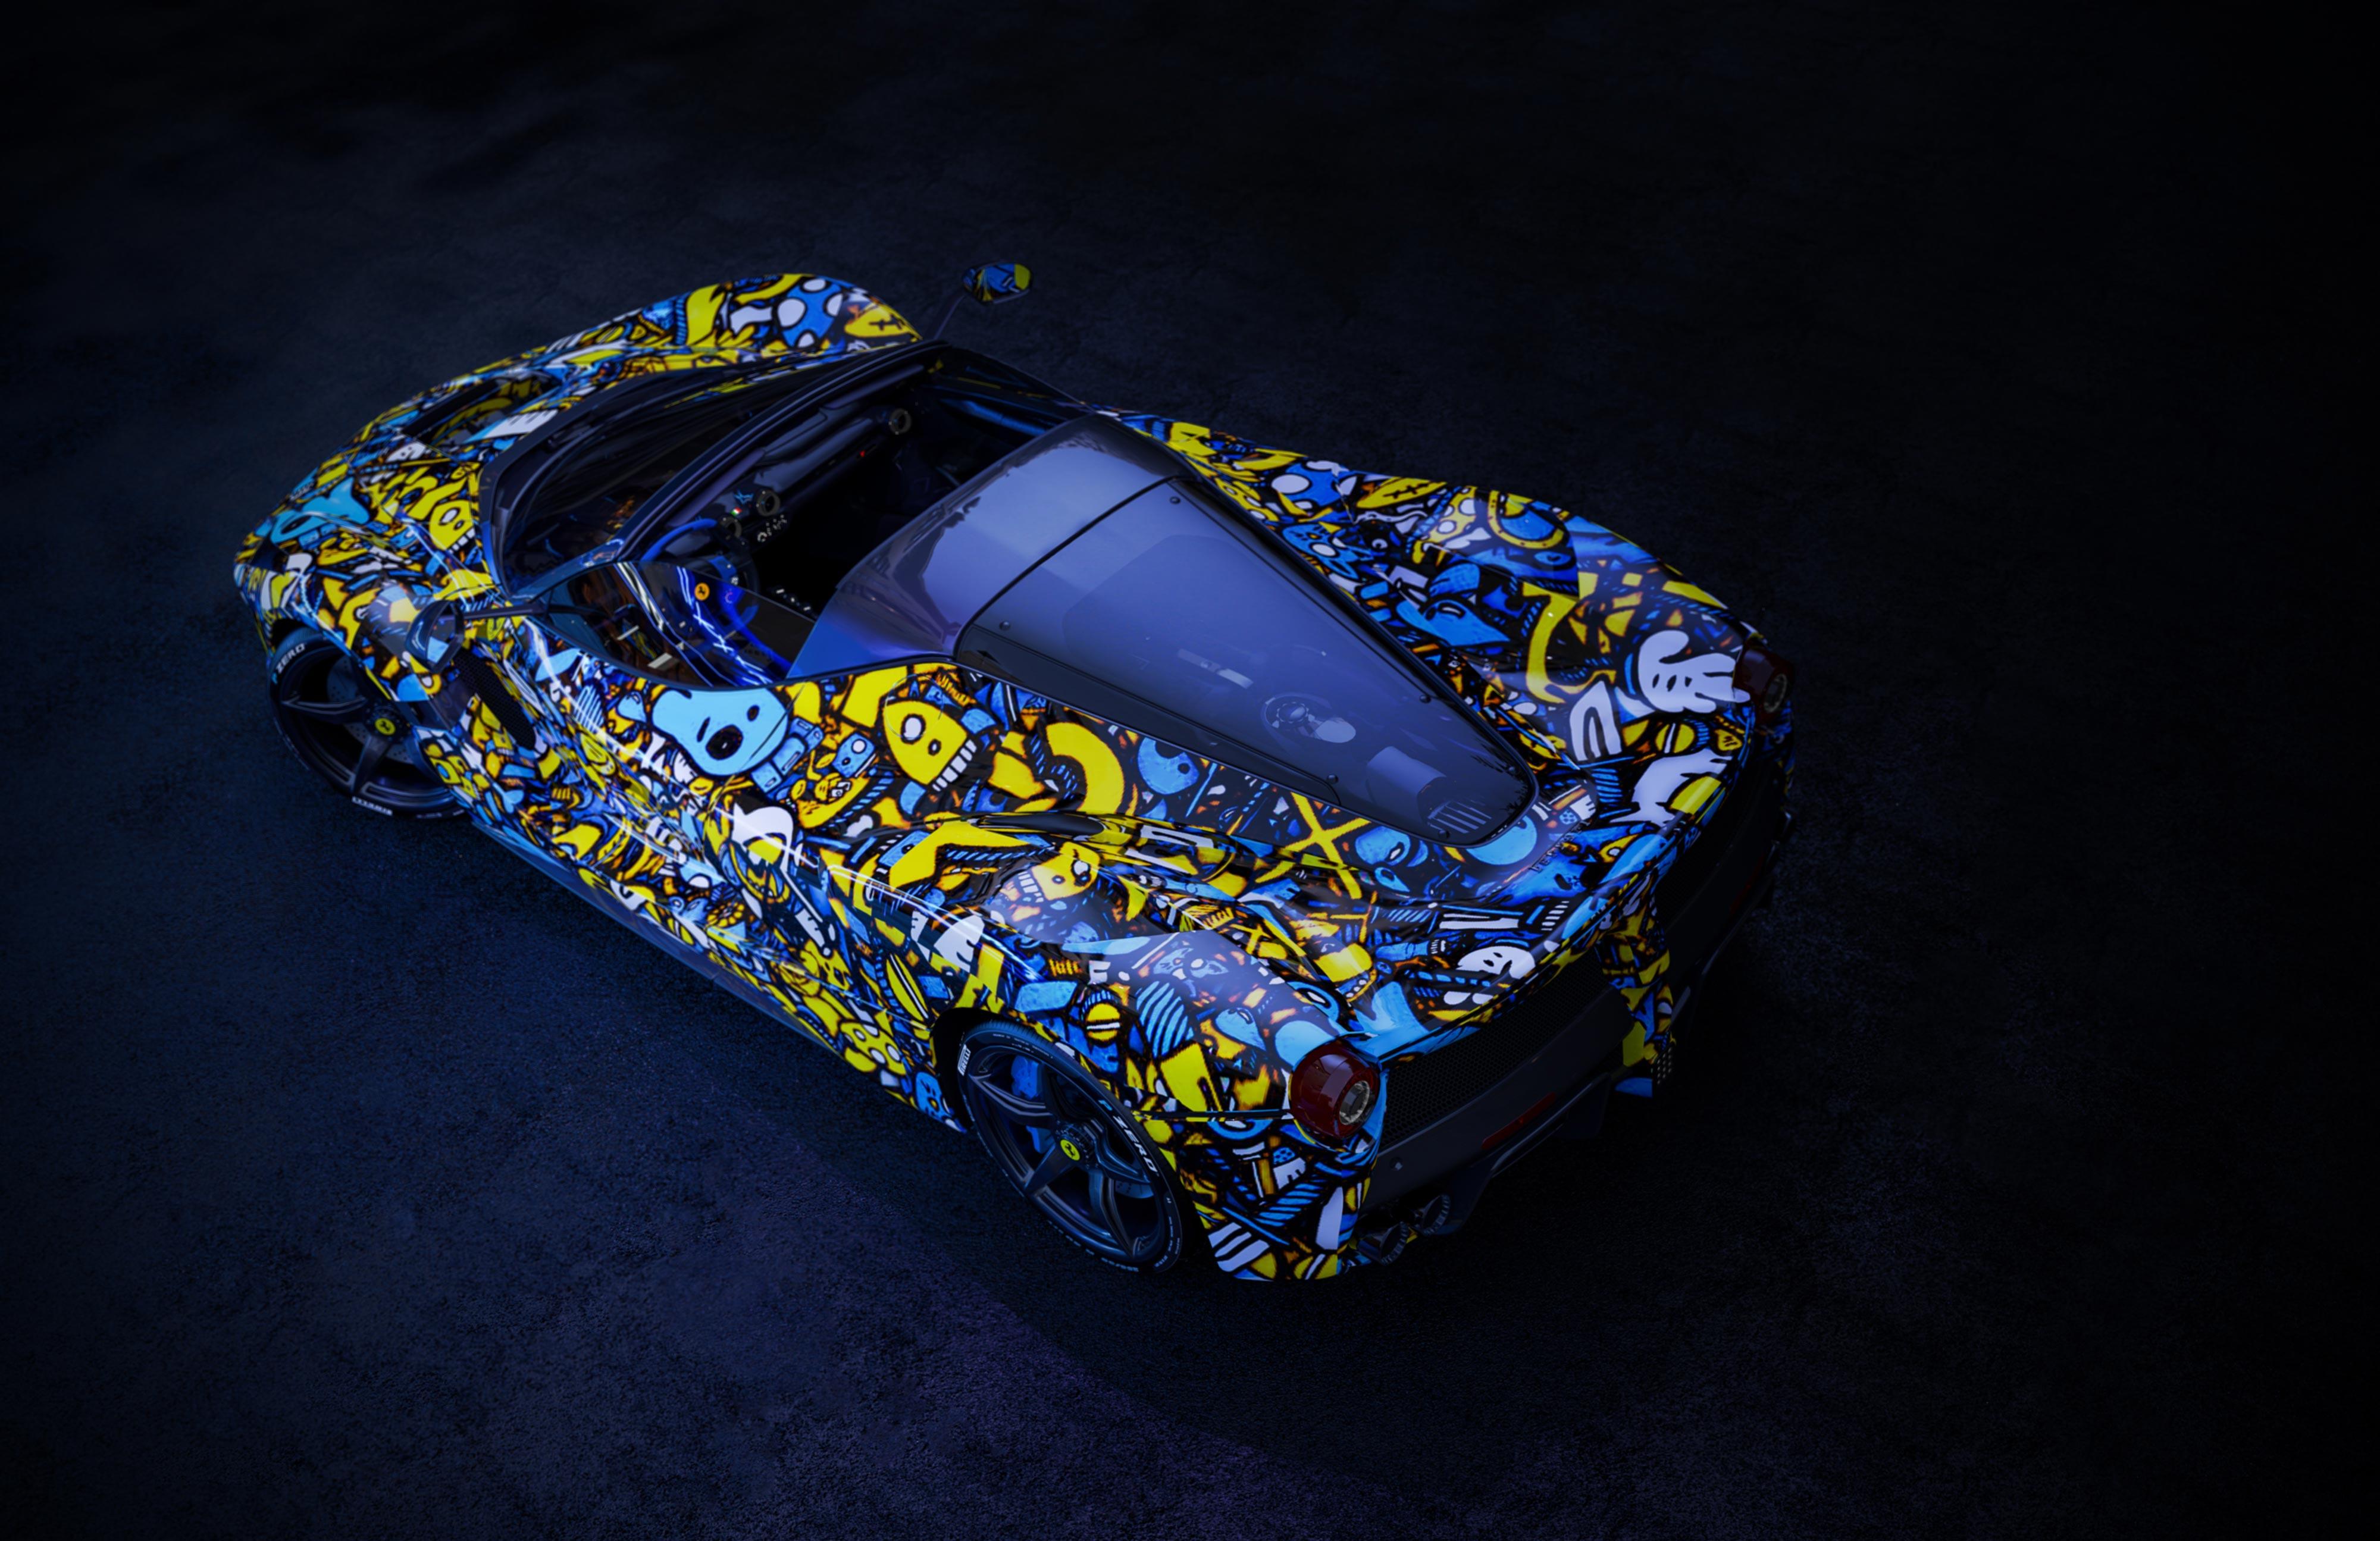 3D Rendering of a Graffiti Ferrari LaFerrari